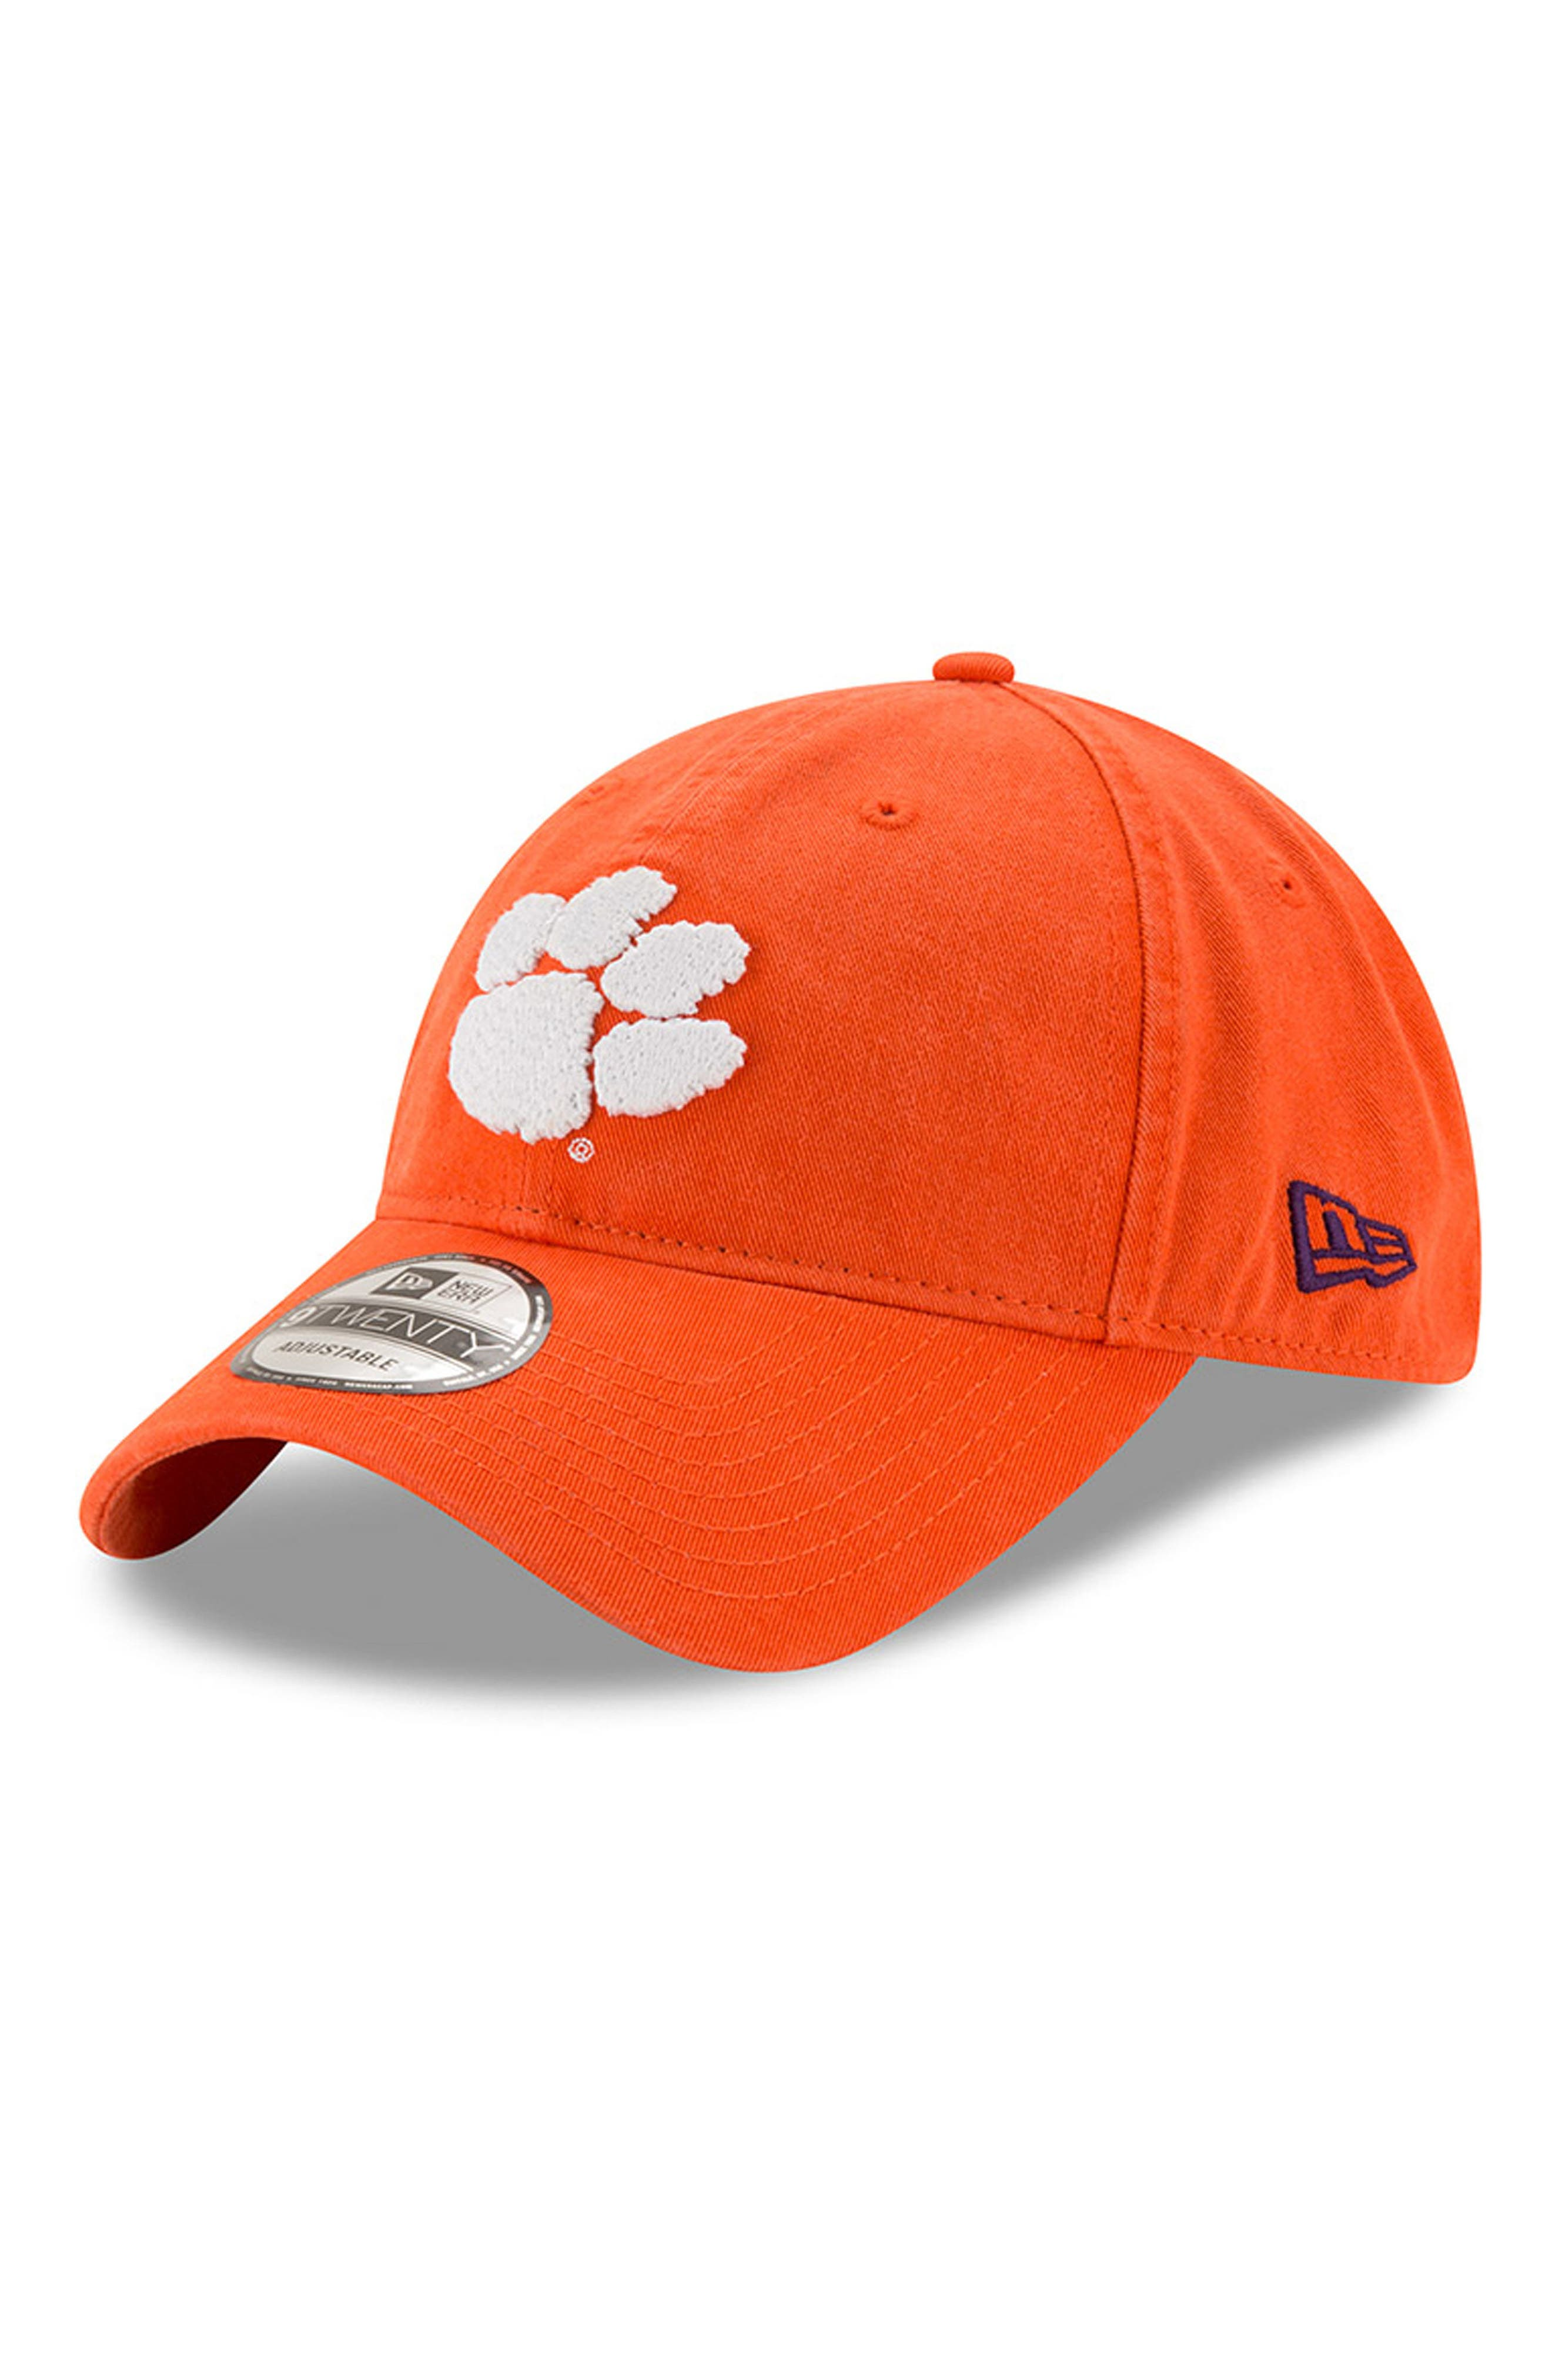 New Era Collegiate Core Classic - Clemson Tigers Baseball Cap,                         Main,                         color,